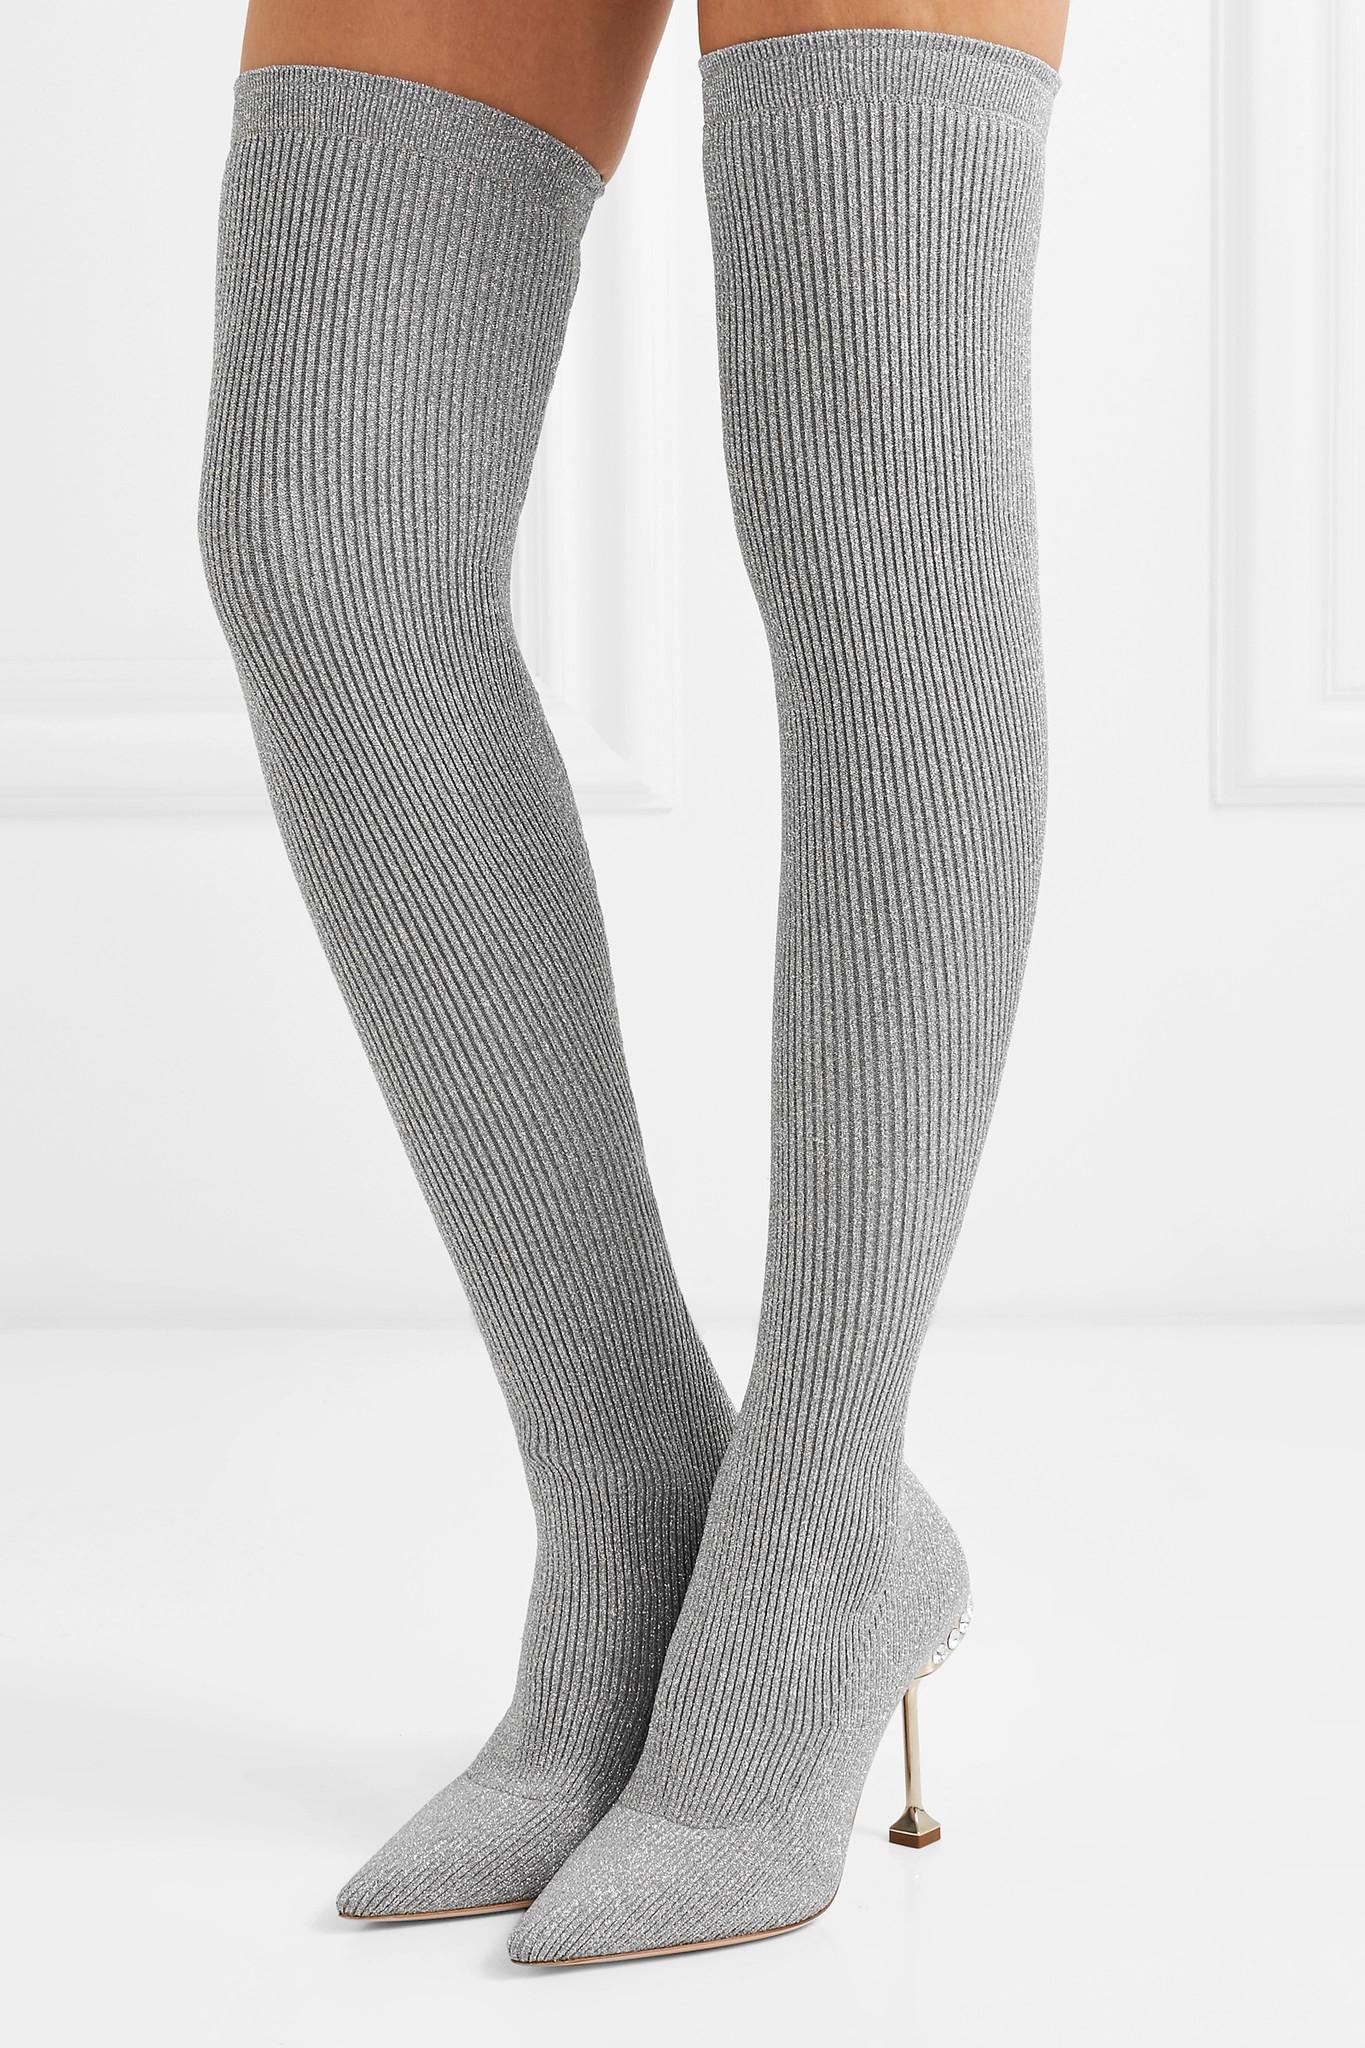 3e71c29b566 Miu Miu Crystal-embellished Metallic Ribbed-knit Over-the-knee Sock ...